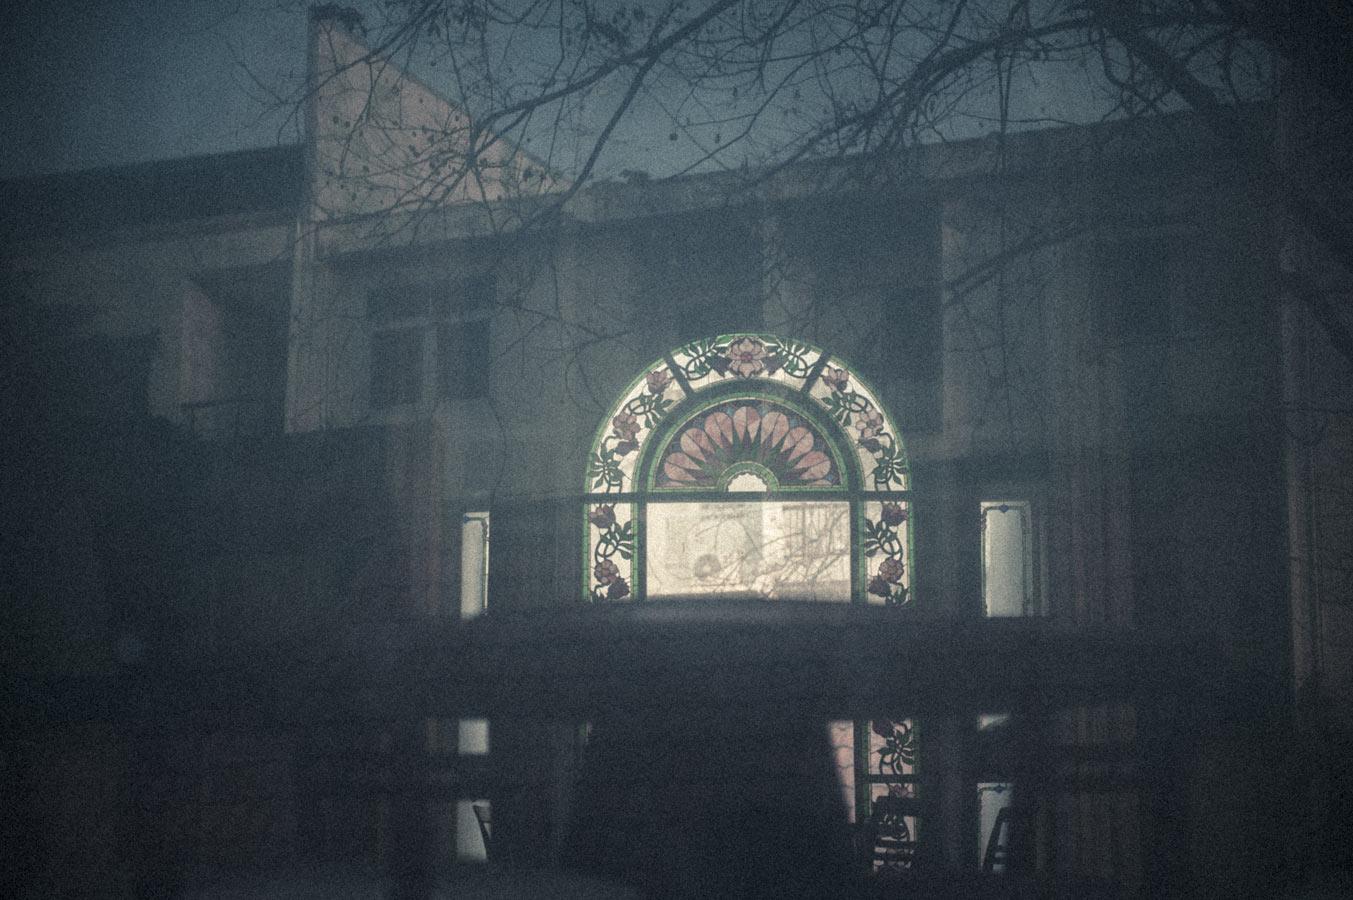 Jamie-Lowe-Photography-Haunted-House-Chiang-Mai-61.jpg